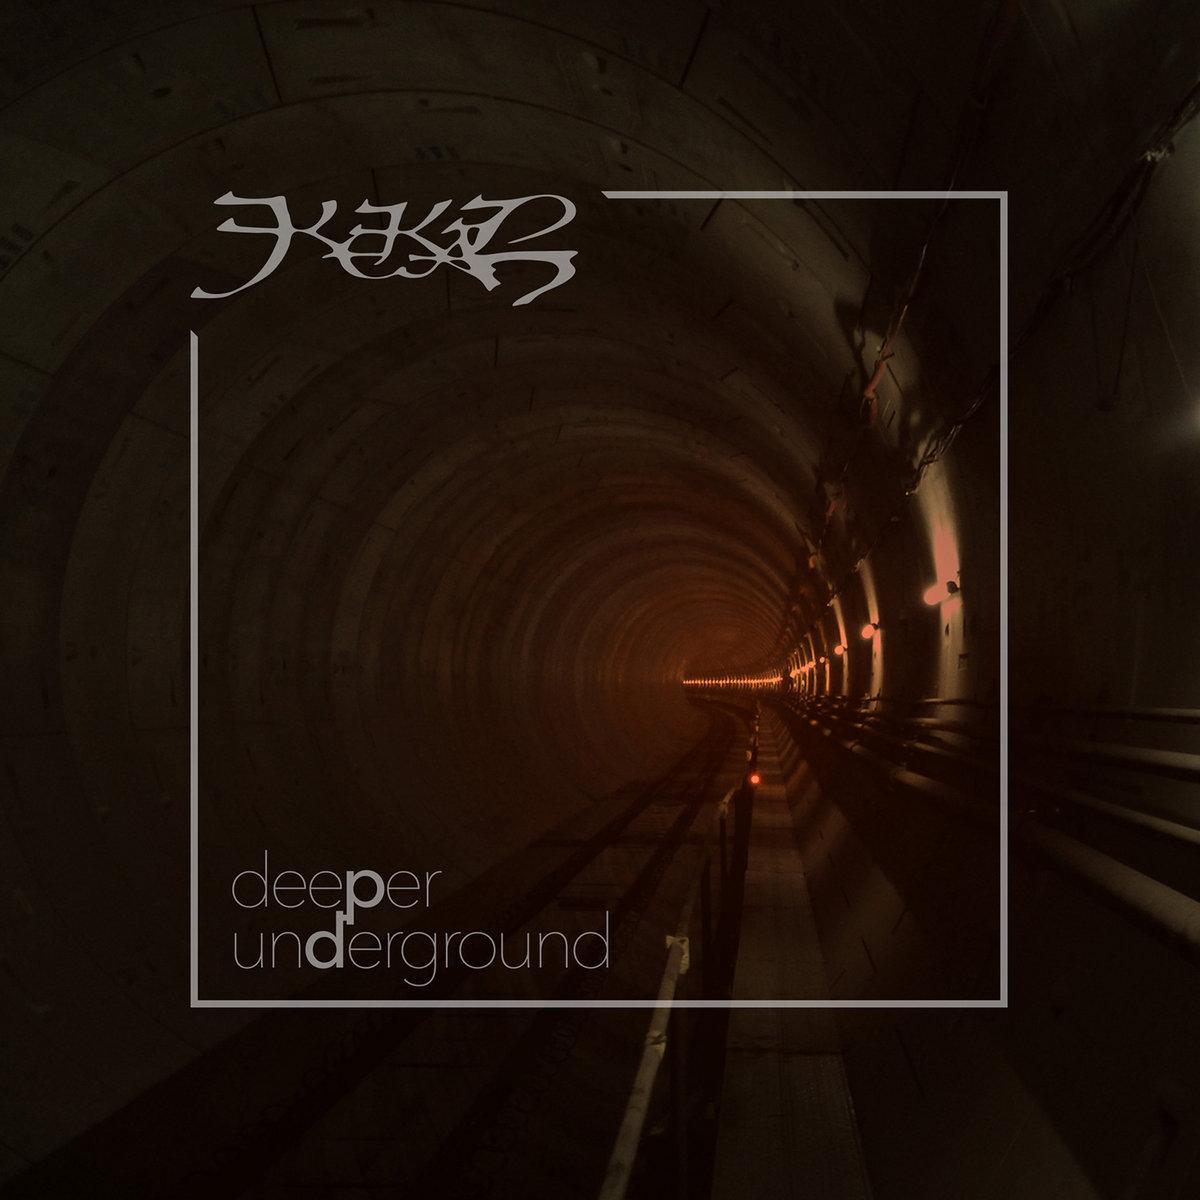 Kekal — Deeper Underground